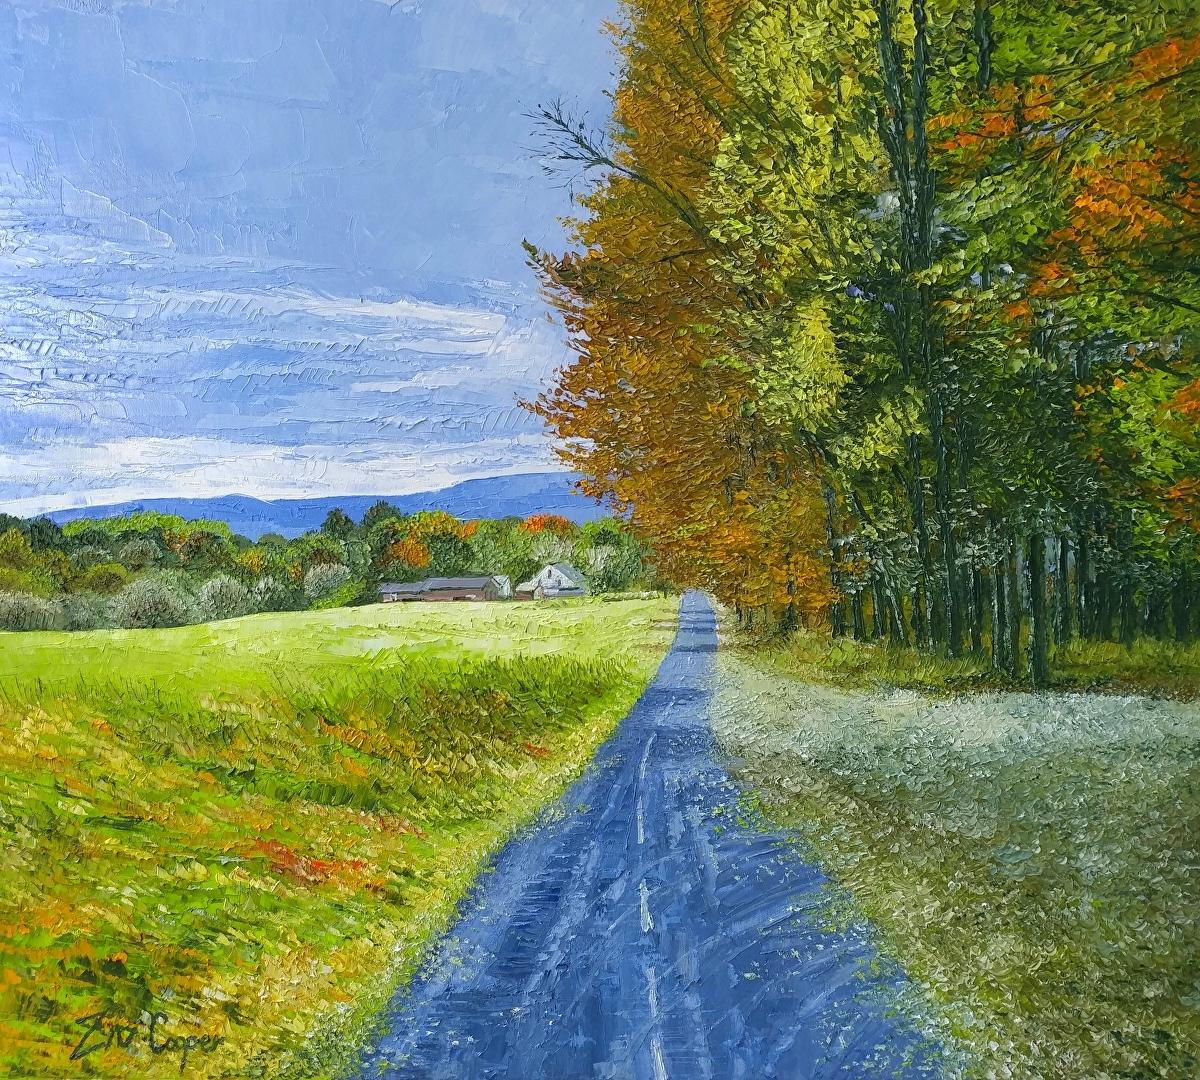 Ziv Cooper - Green Fields